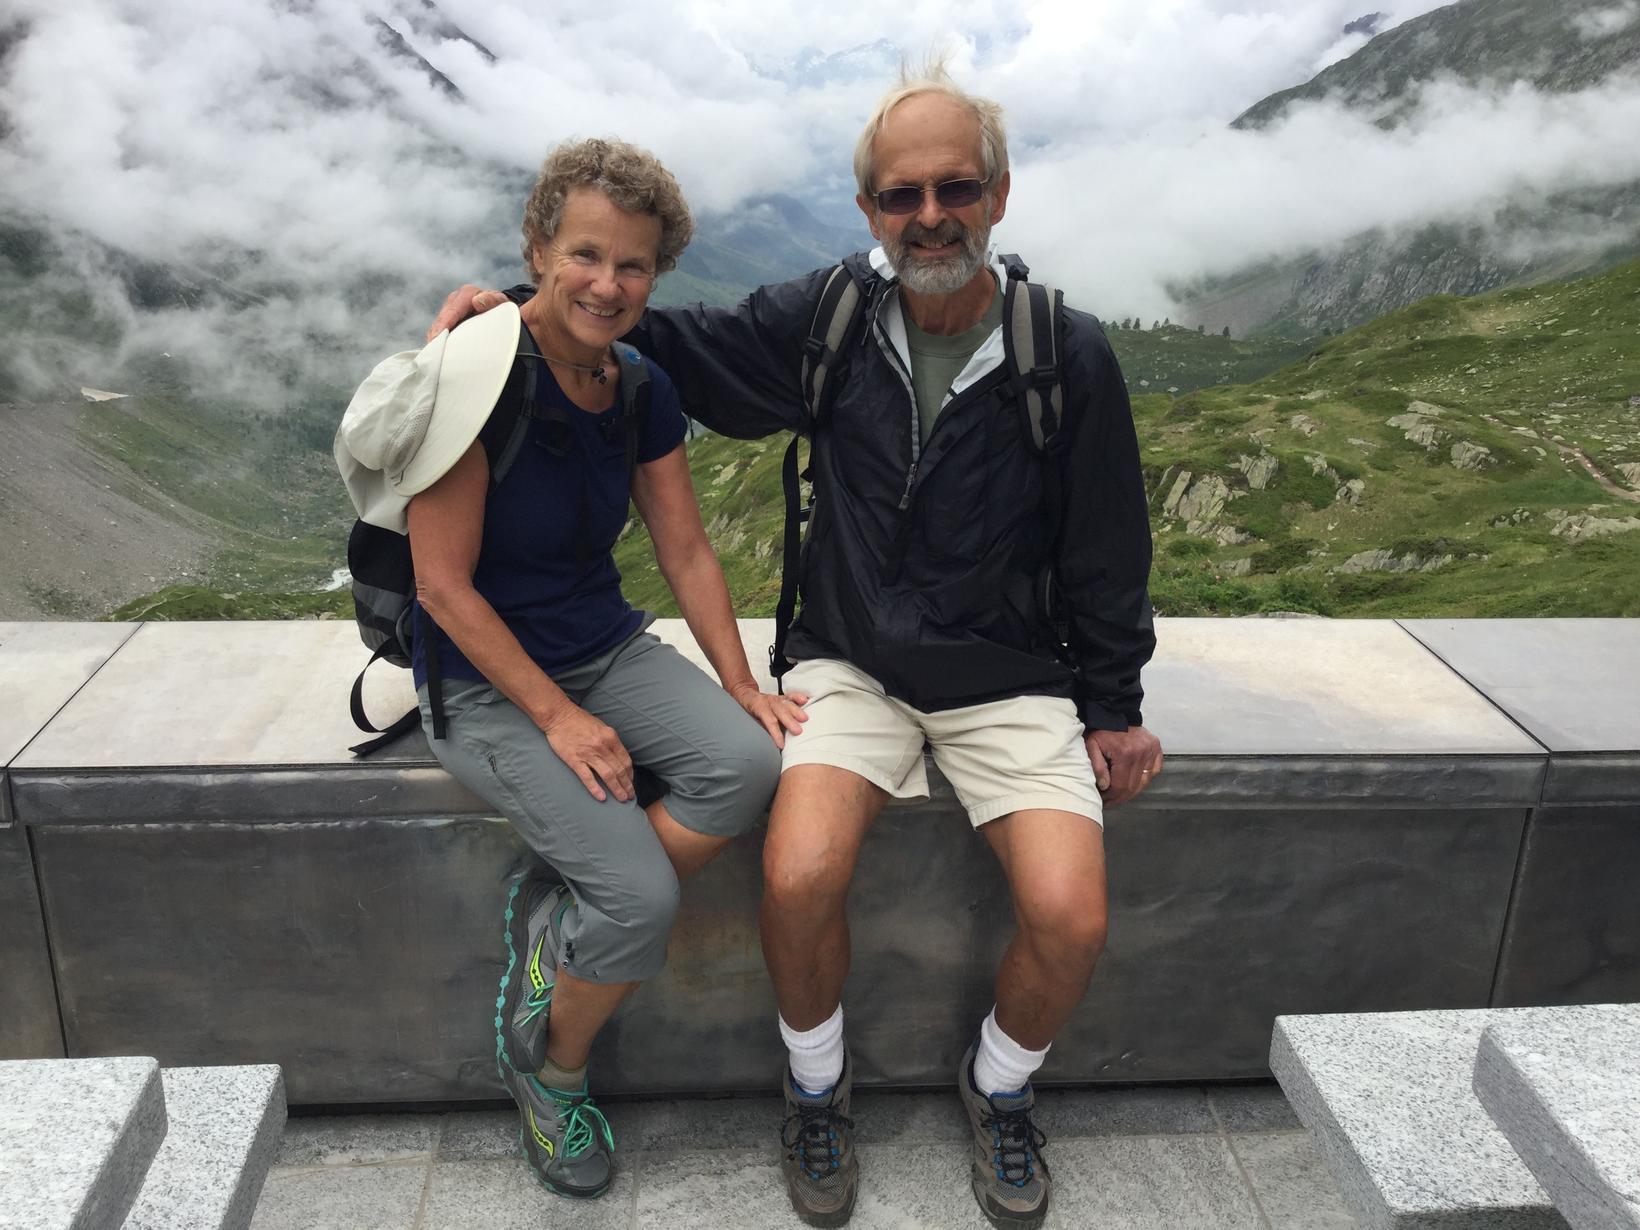 Karen & David from Richland, Washington, United States